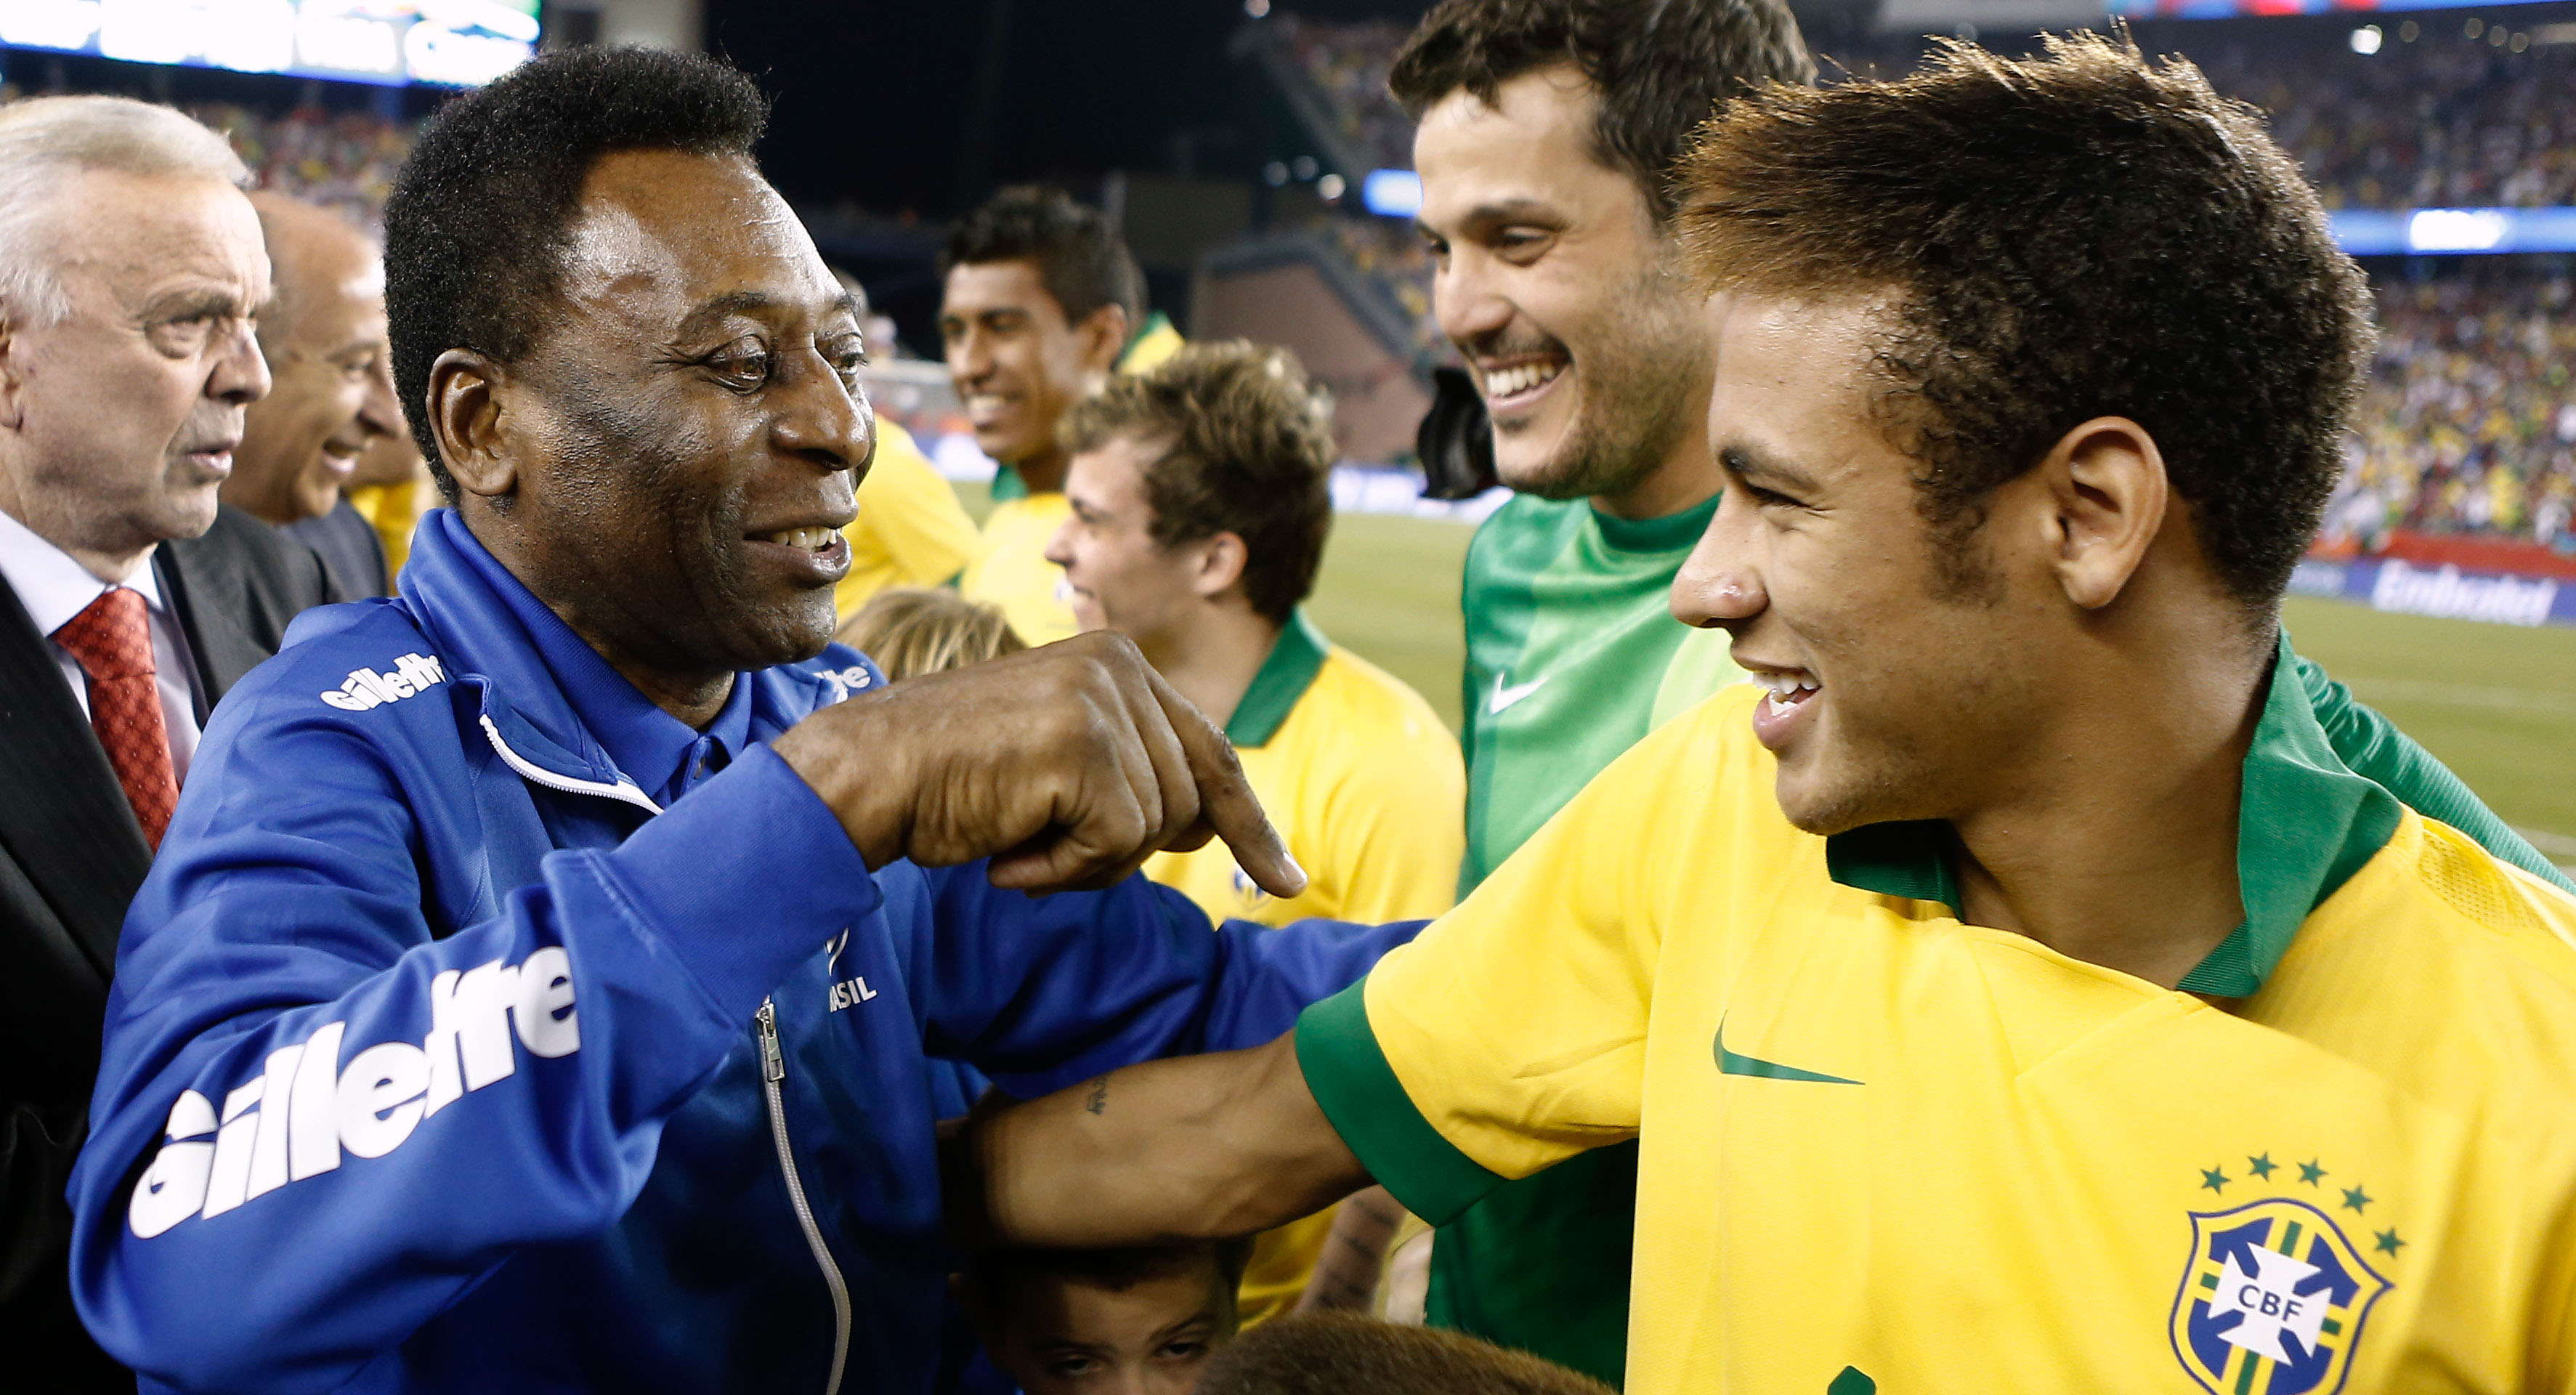 Pele Ingin Neymar Fokus Gunakan Kemampuannya